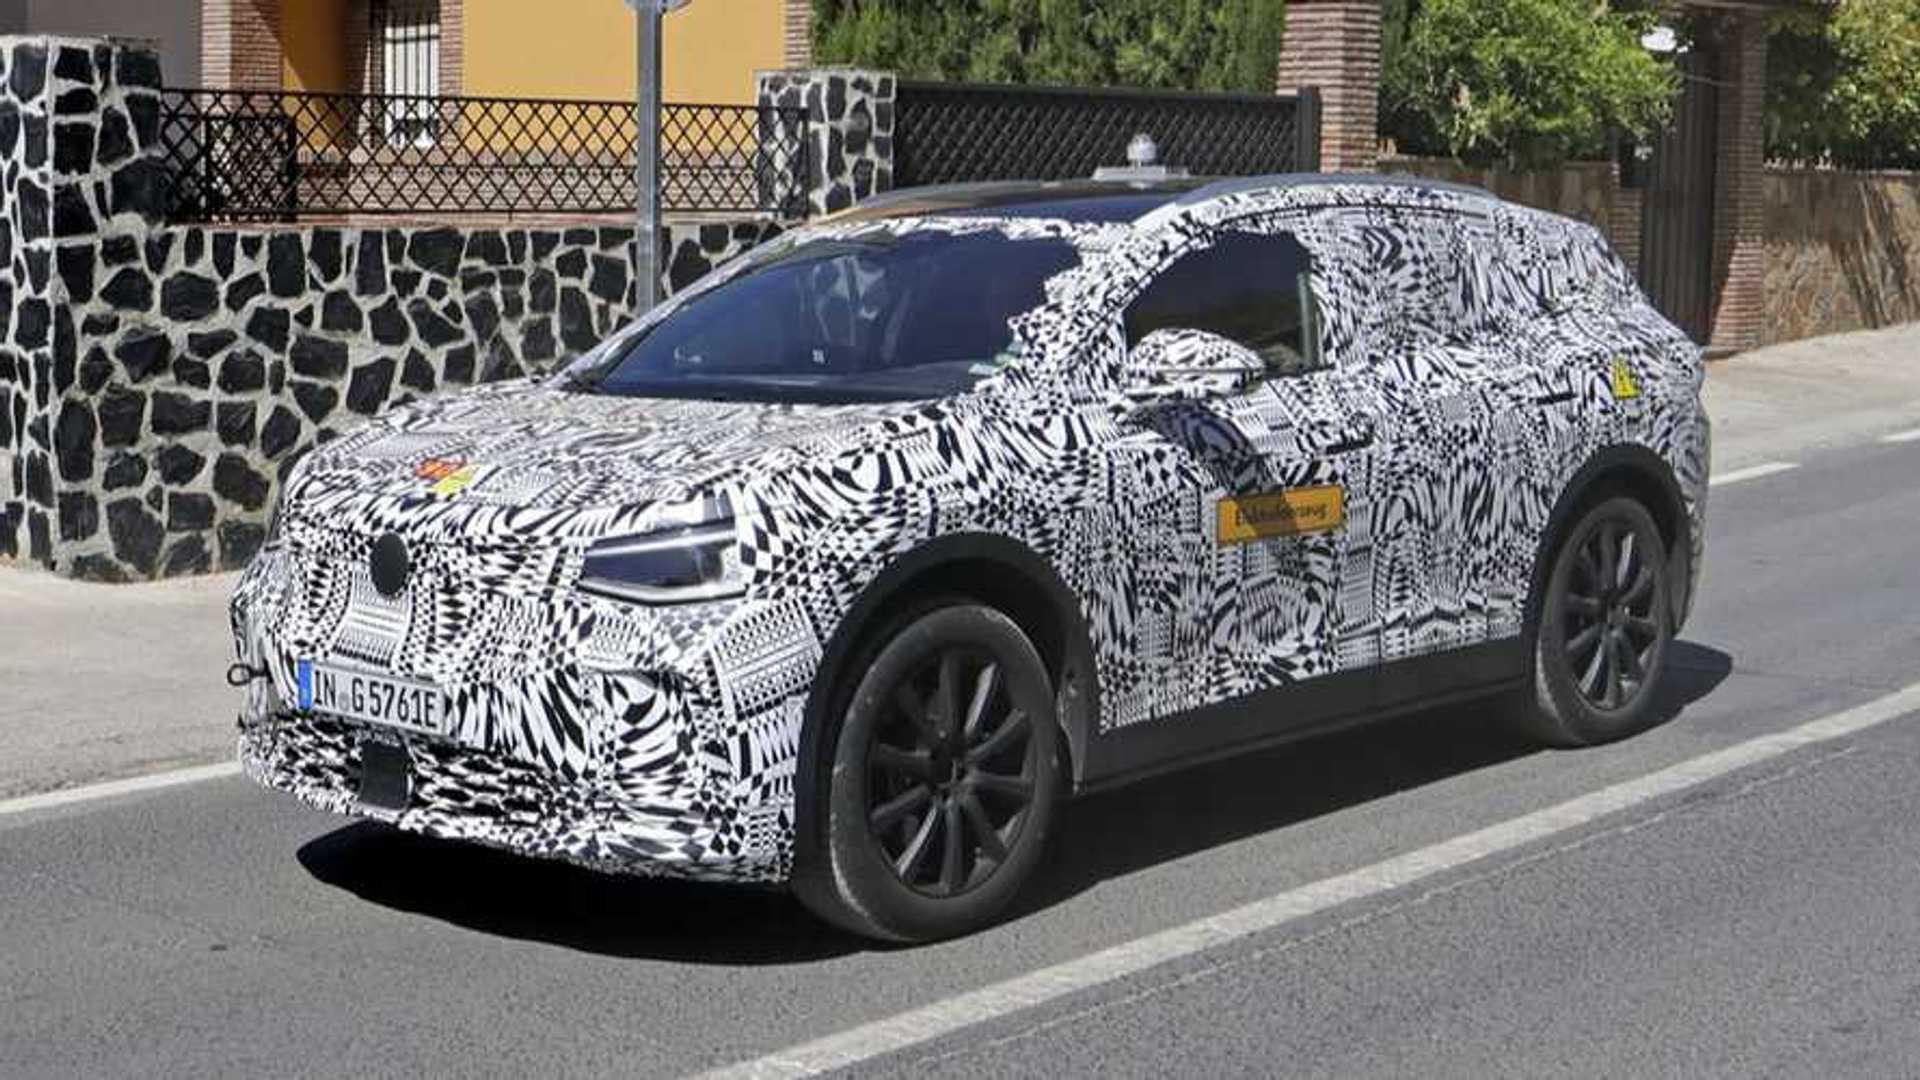 VW ID Crozz Electric Crossover SUV: Design, Release >> Volkswagen I D Crozz Electric Crossover Spotted Again In Camo